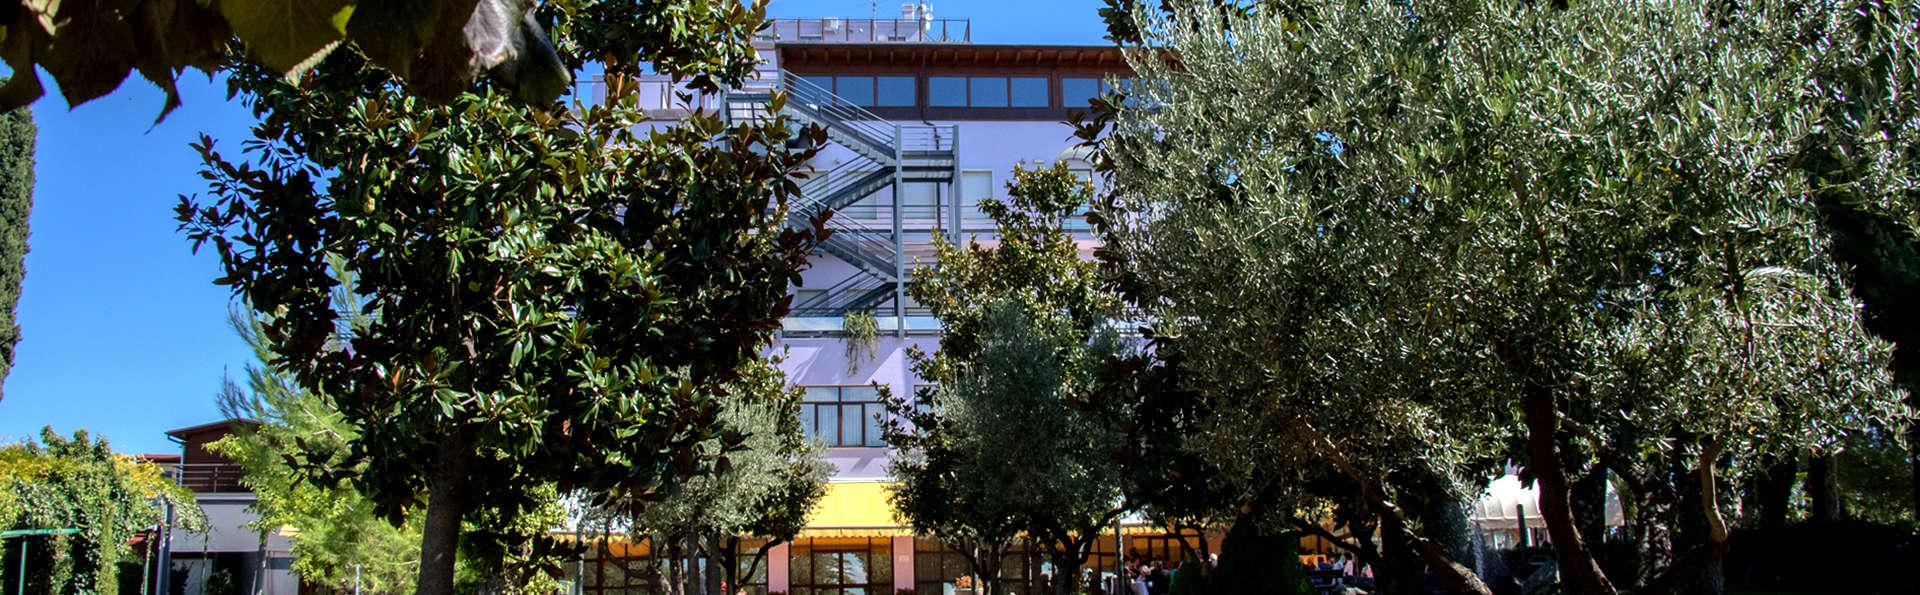 Parc Hotel Villa Immacolata - Edit_Front2.jpg